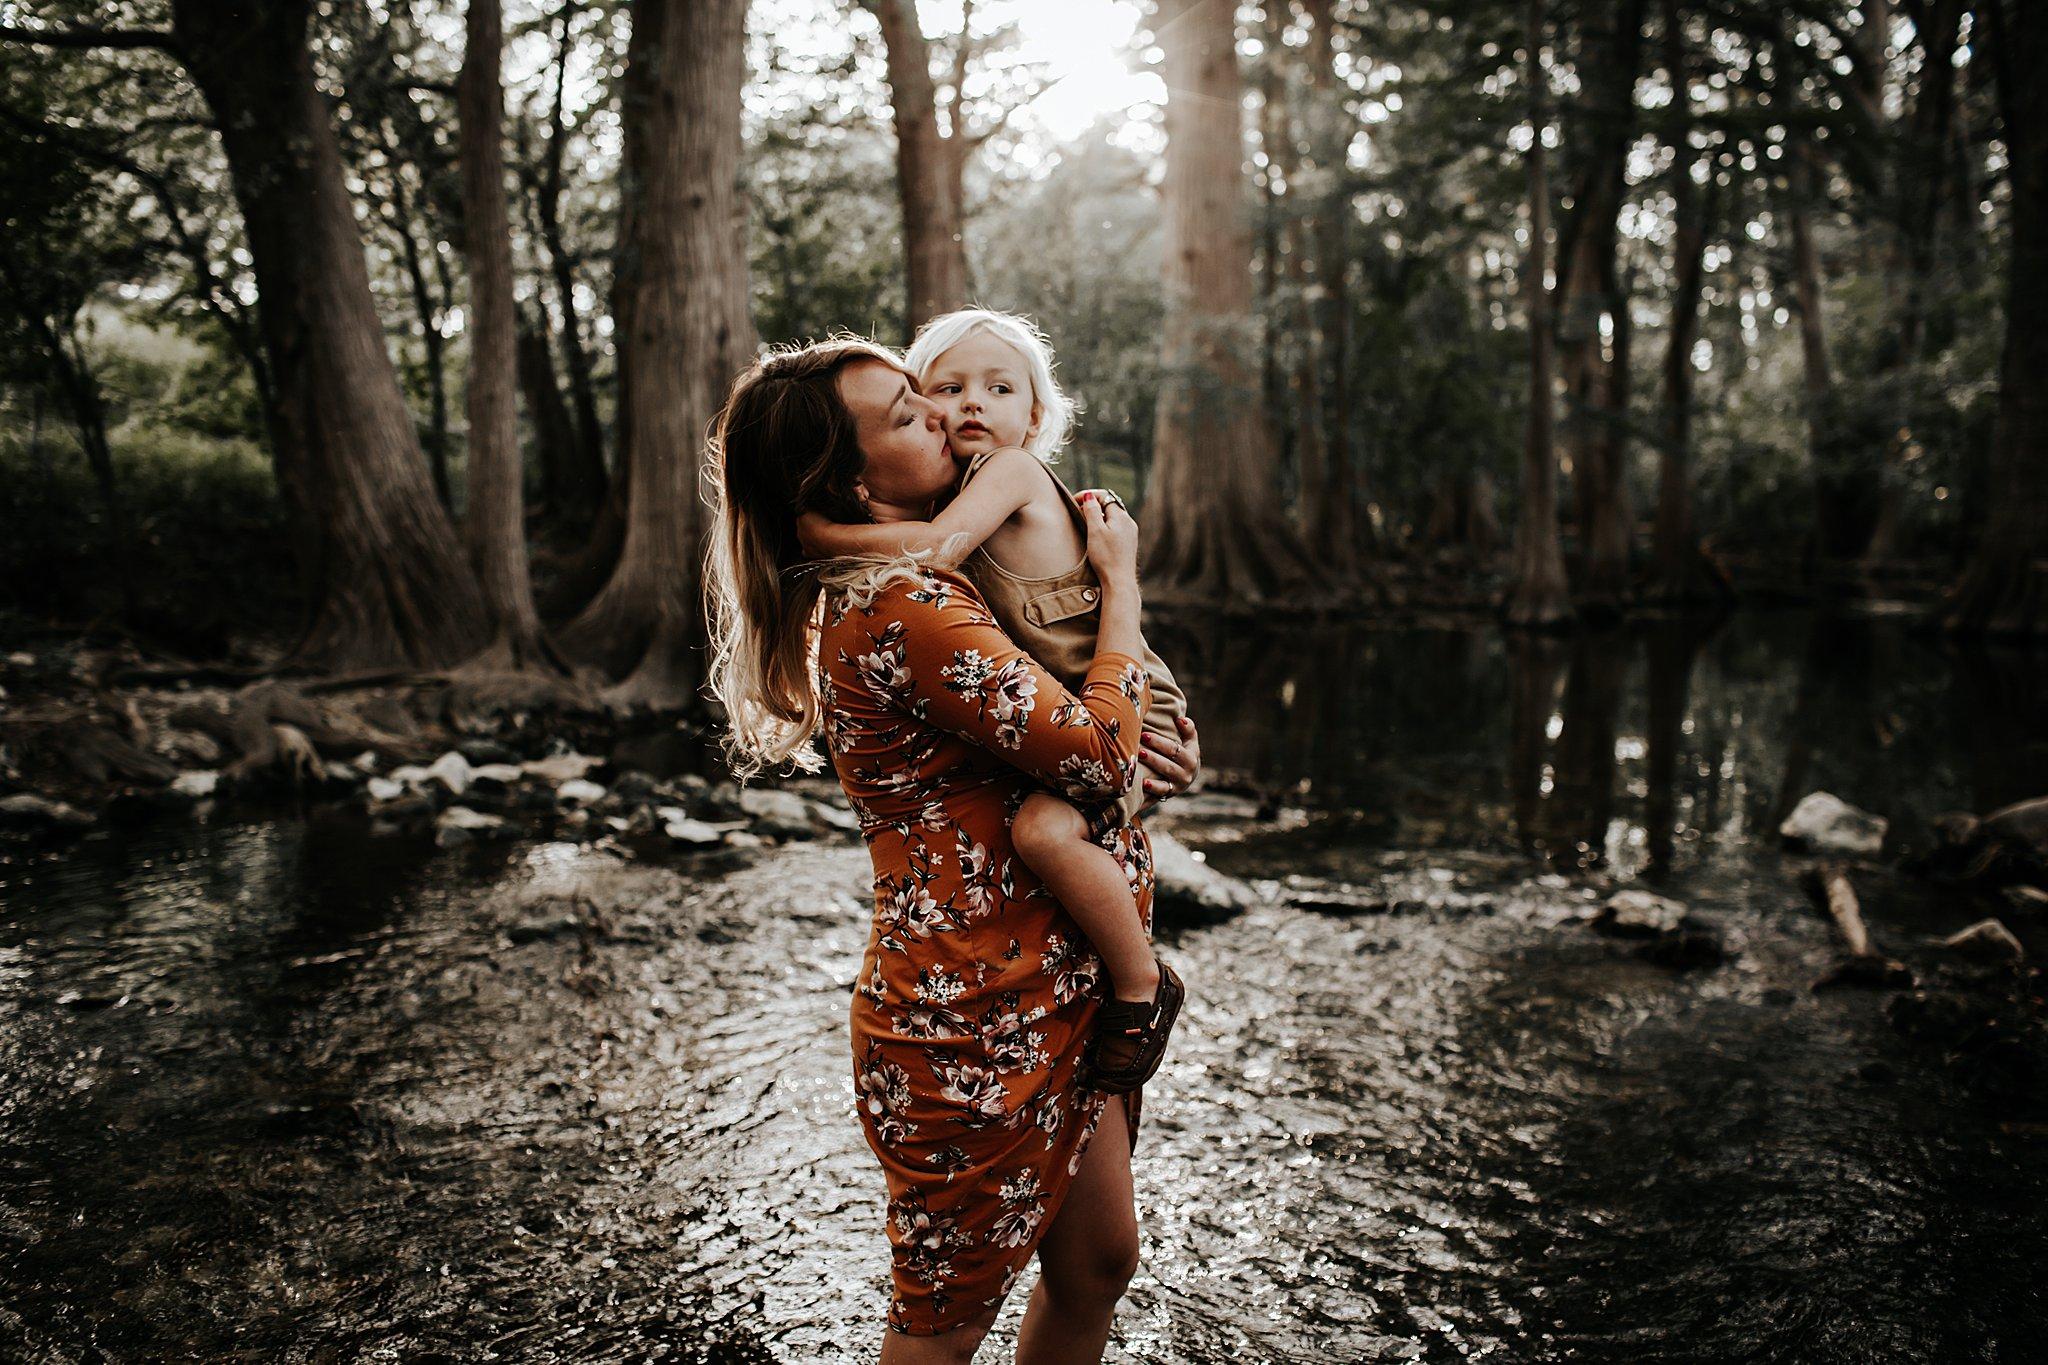 Shannon-San-Antonio-Maternity-Photographer-8_WEB.jpg